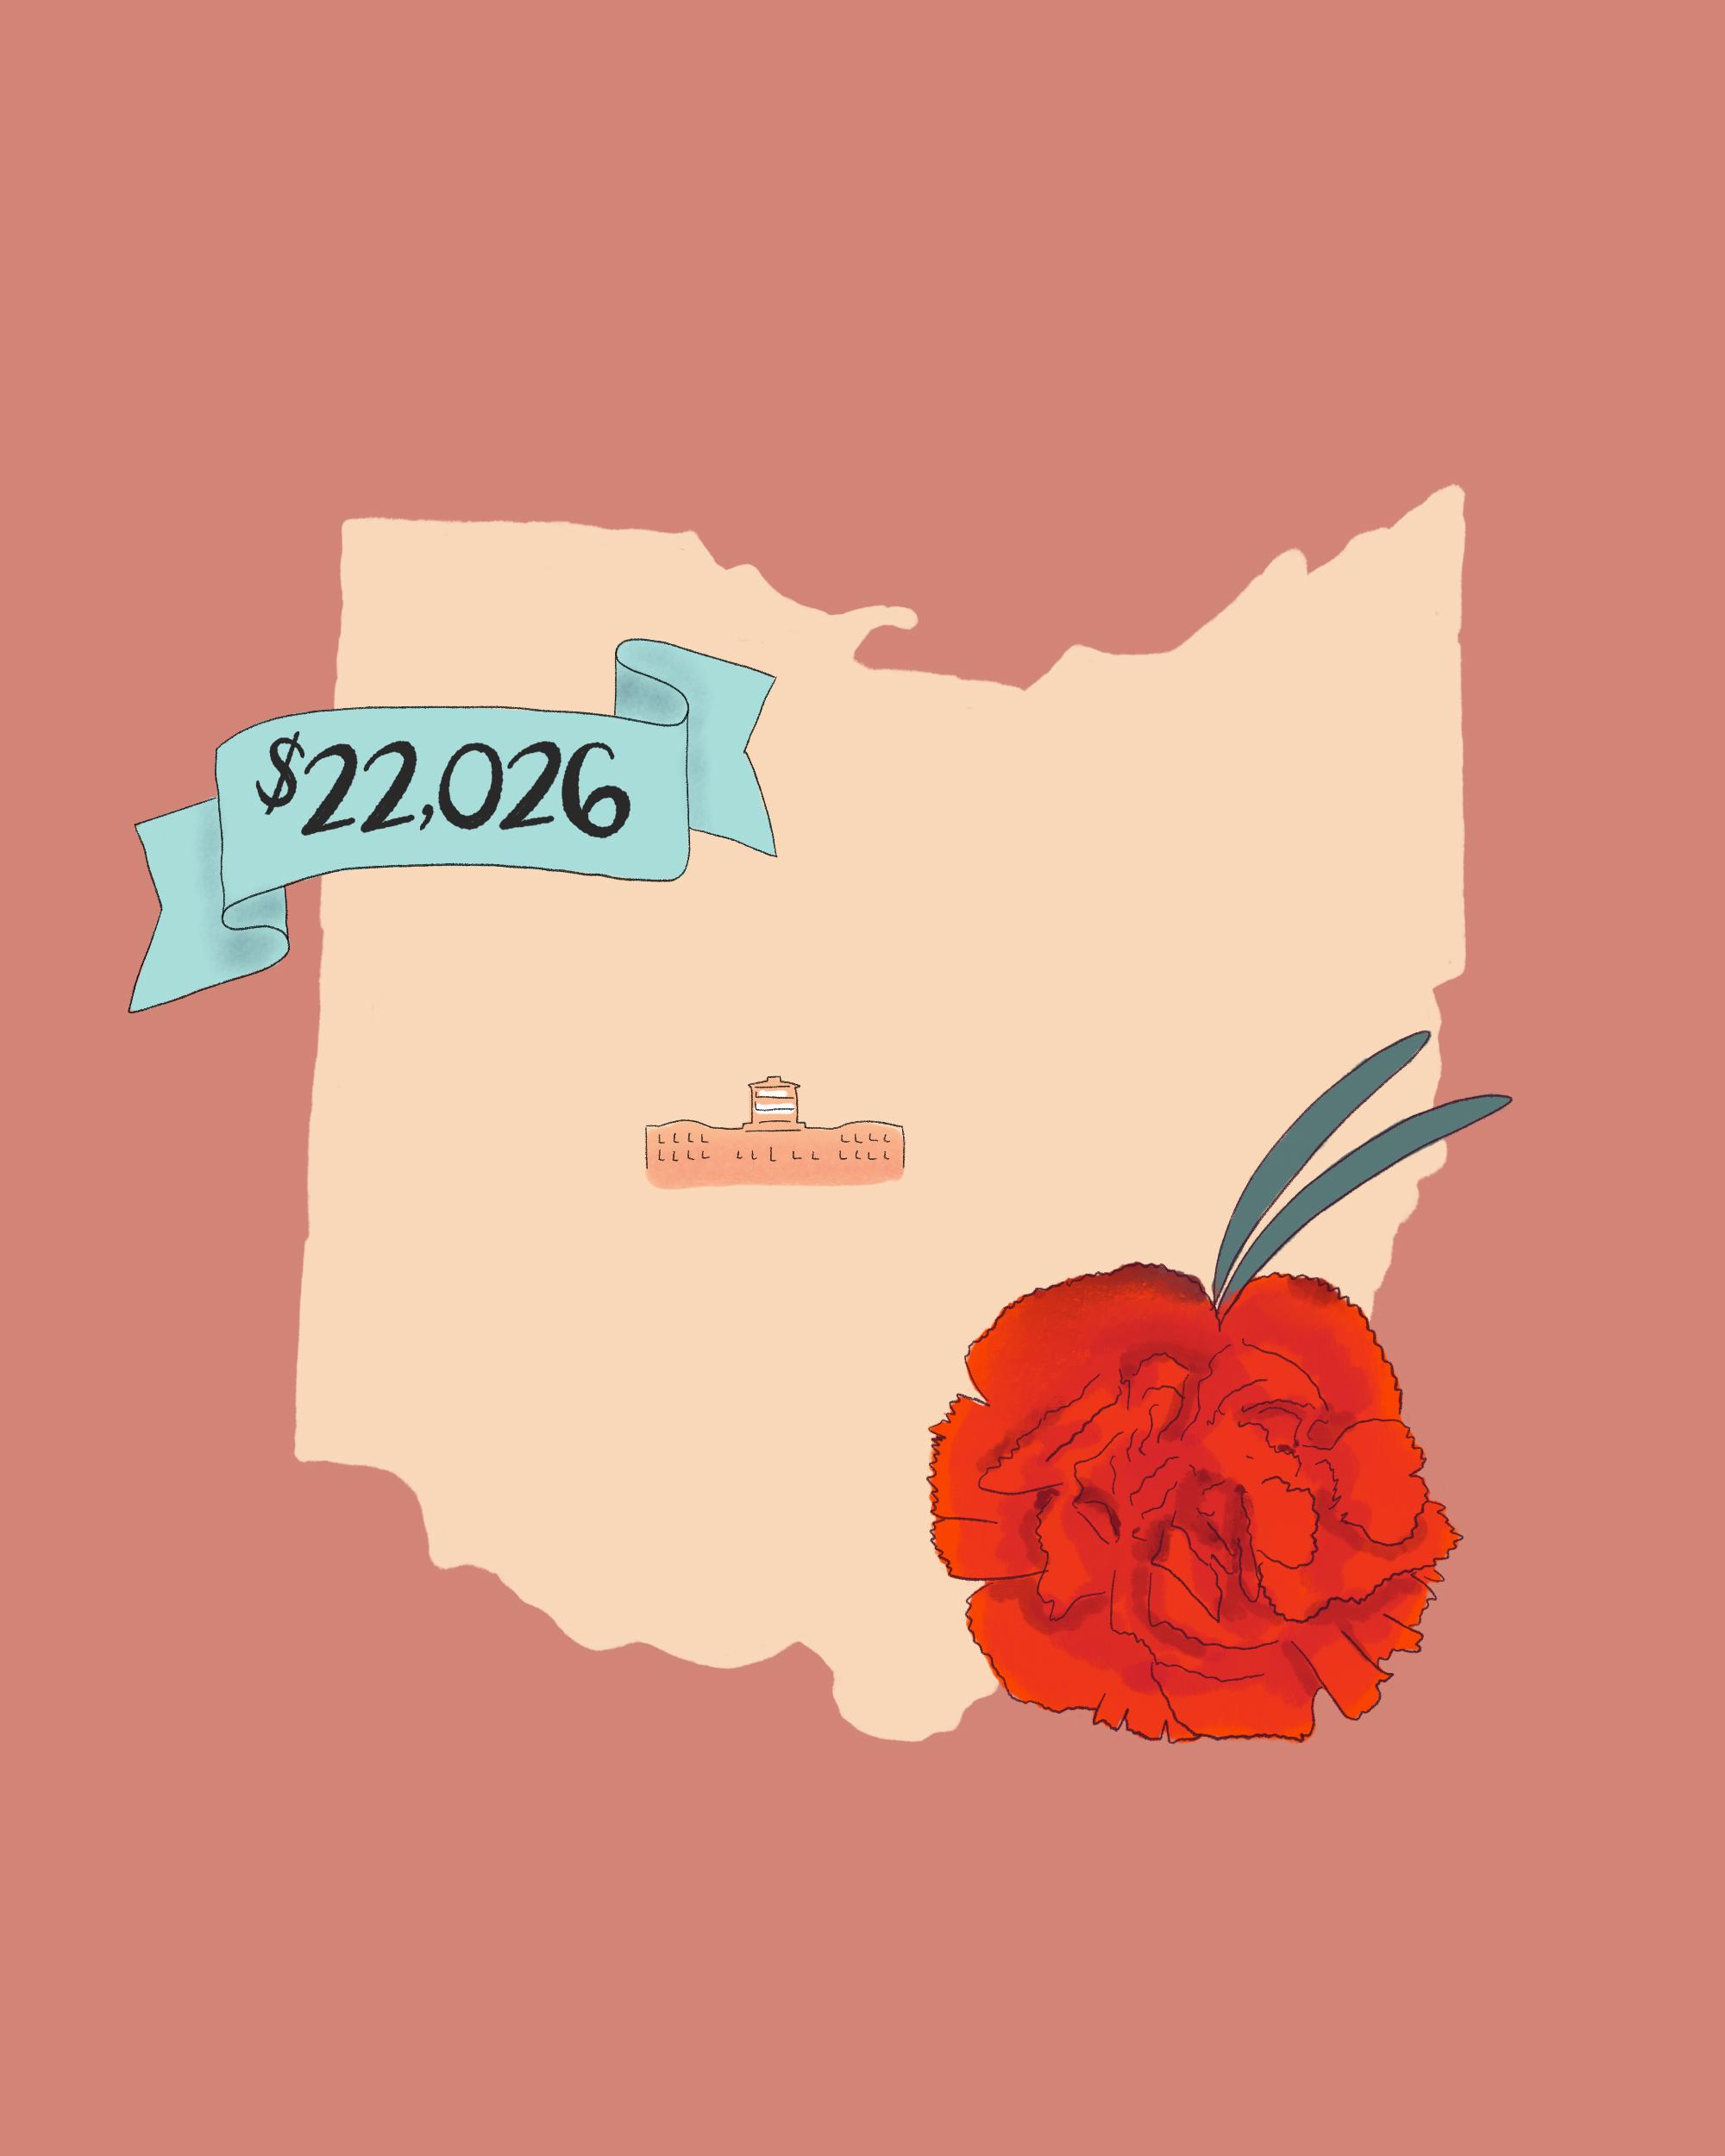 state wedding costs illustration ohio